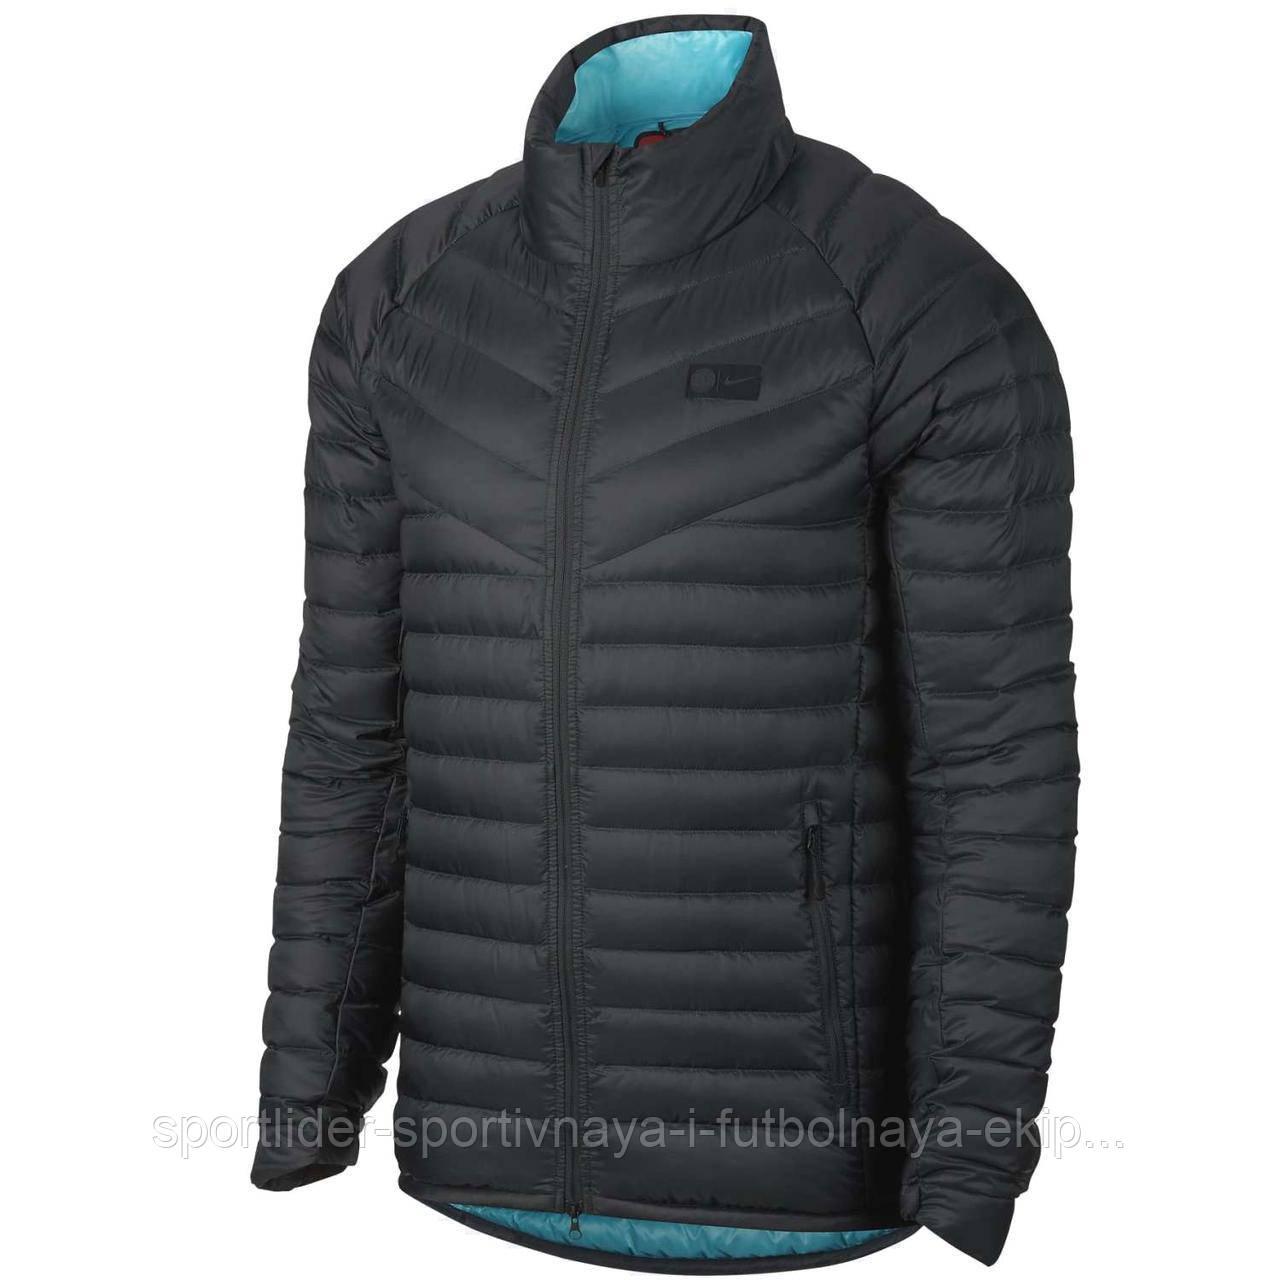 dd4730c2 Мужская куртка с пуховым наполнителем Nike Chelsea FC 2017/2018 Down Jacket  905499-064